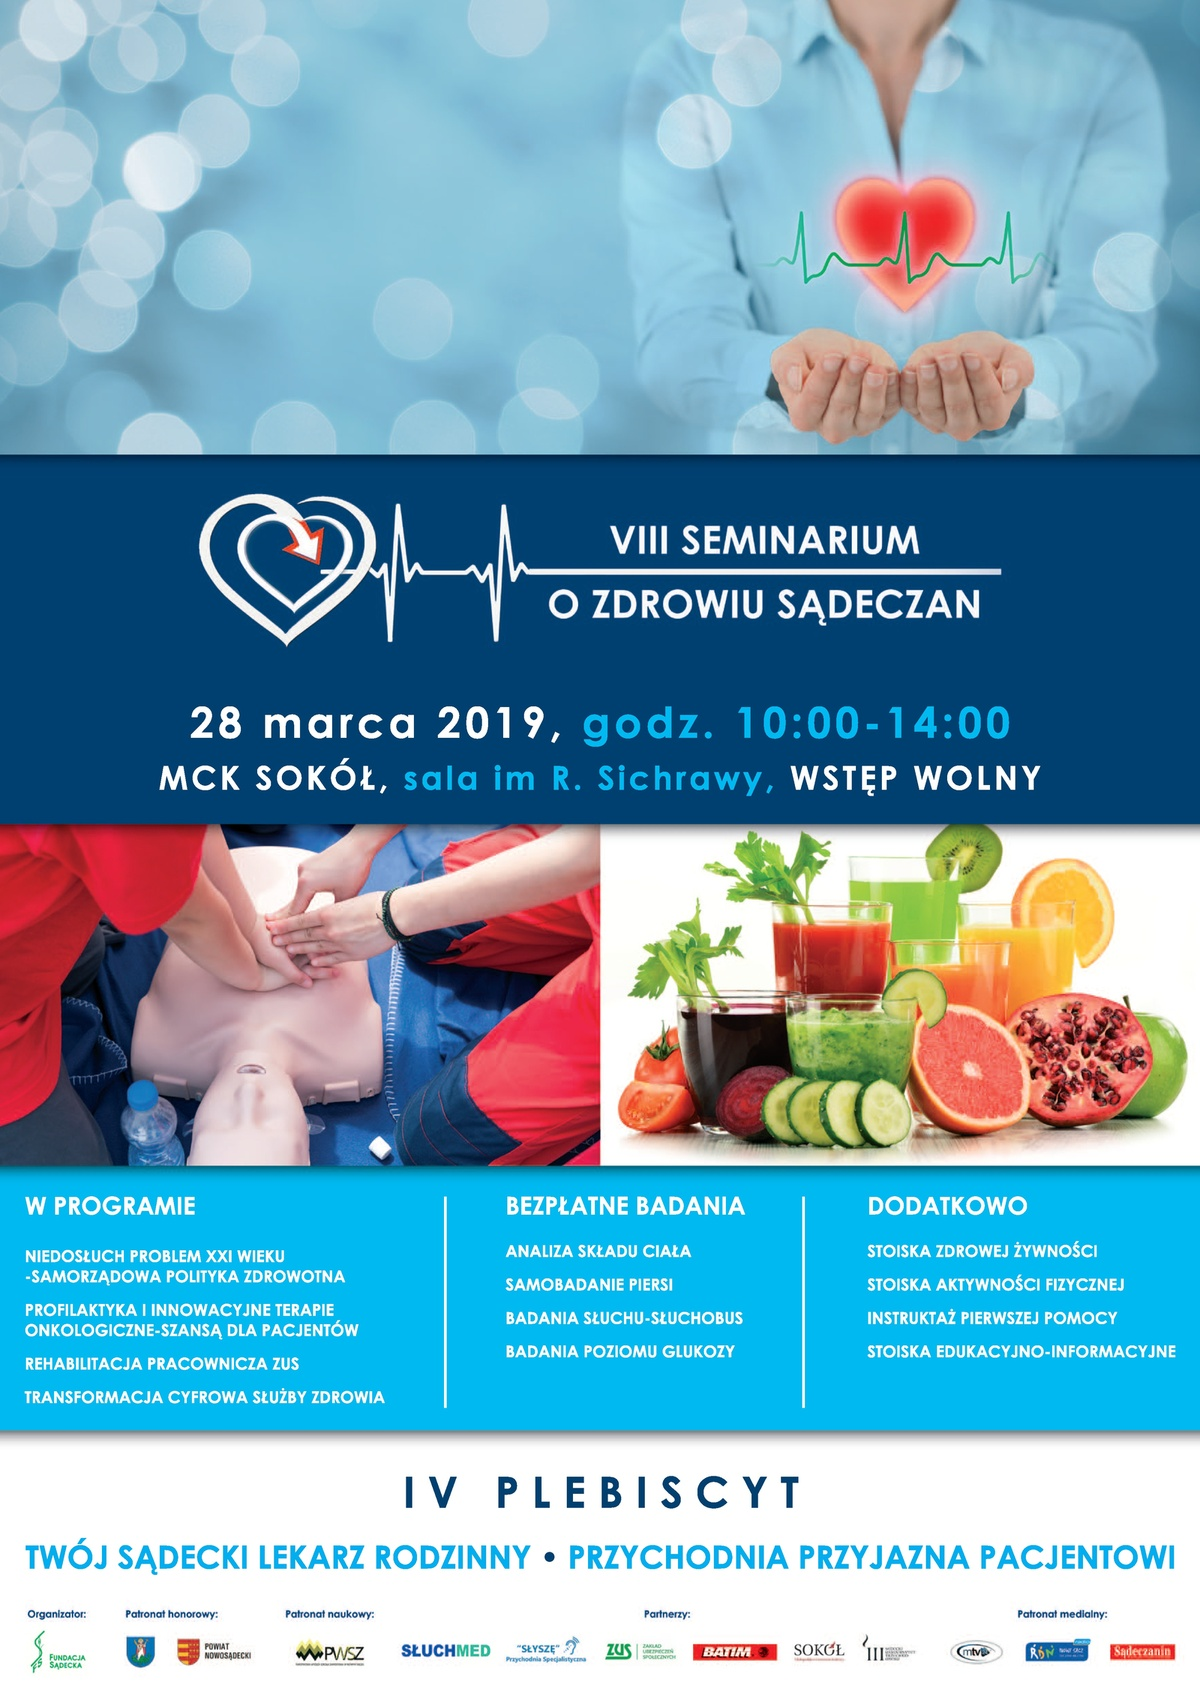 VIII Seminarium o zdrowiu Sądeczan